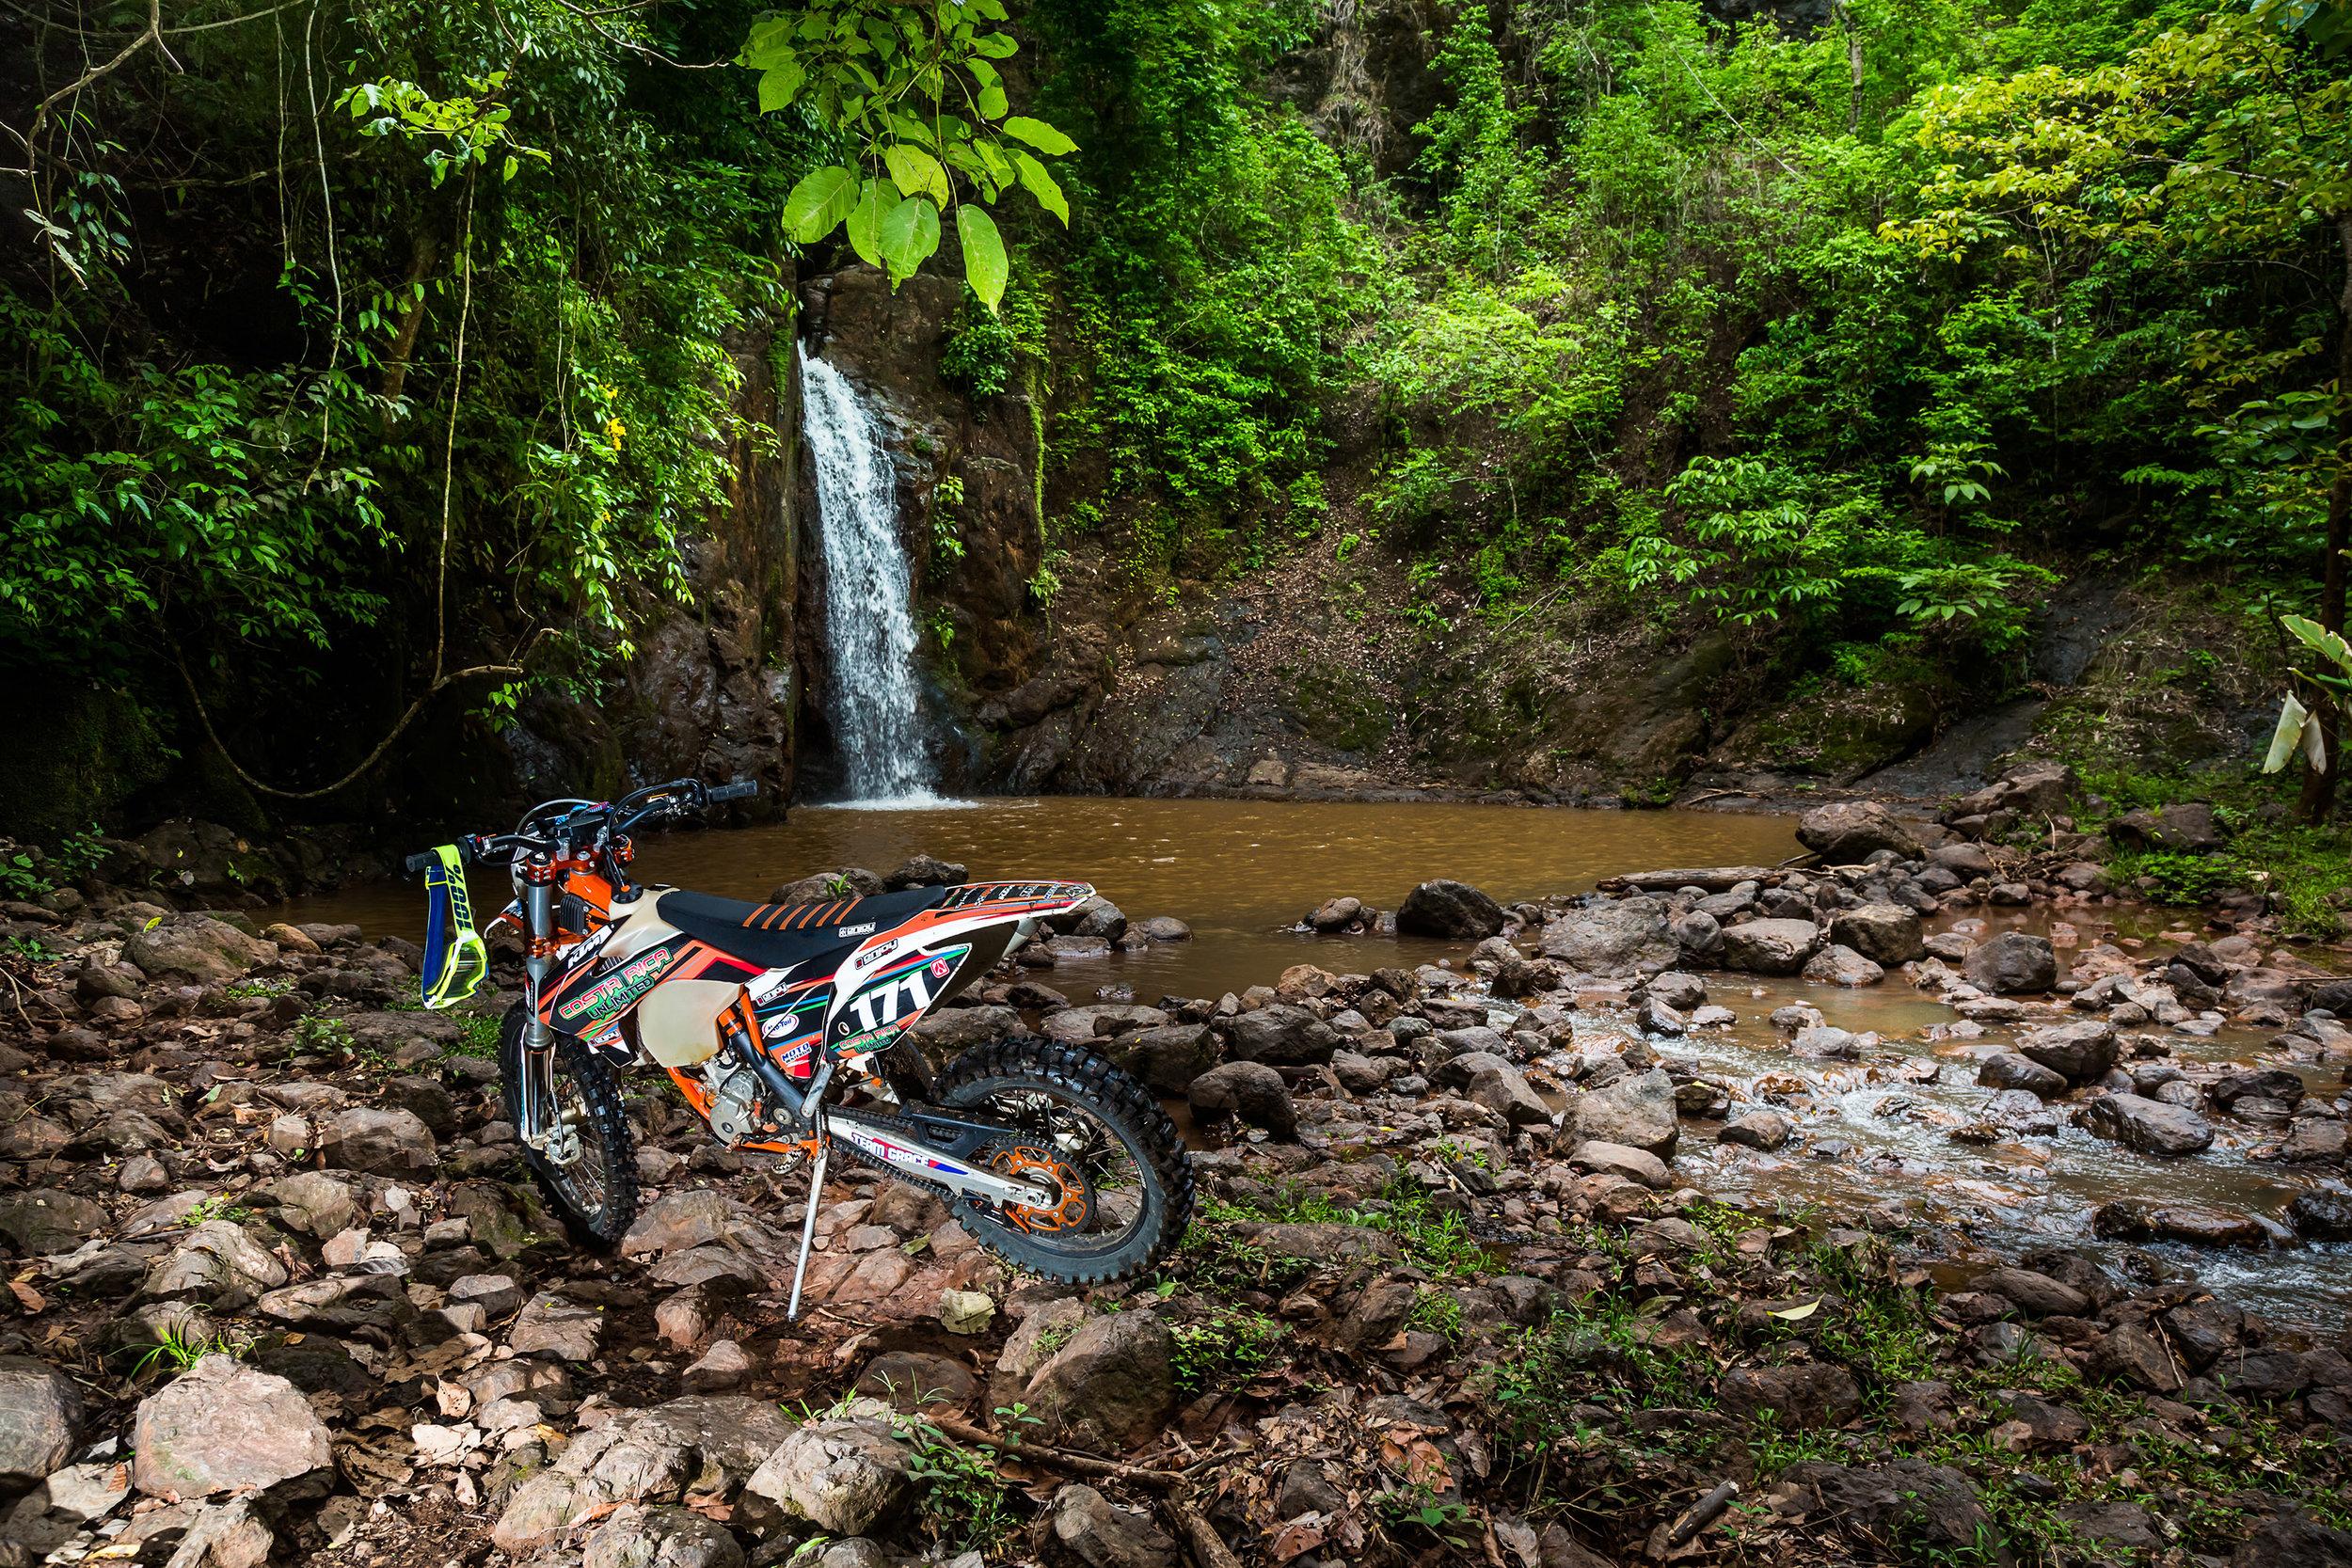 Costa_Rica-ODV_6023.jpg